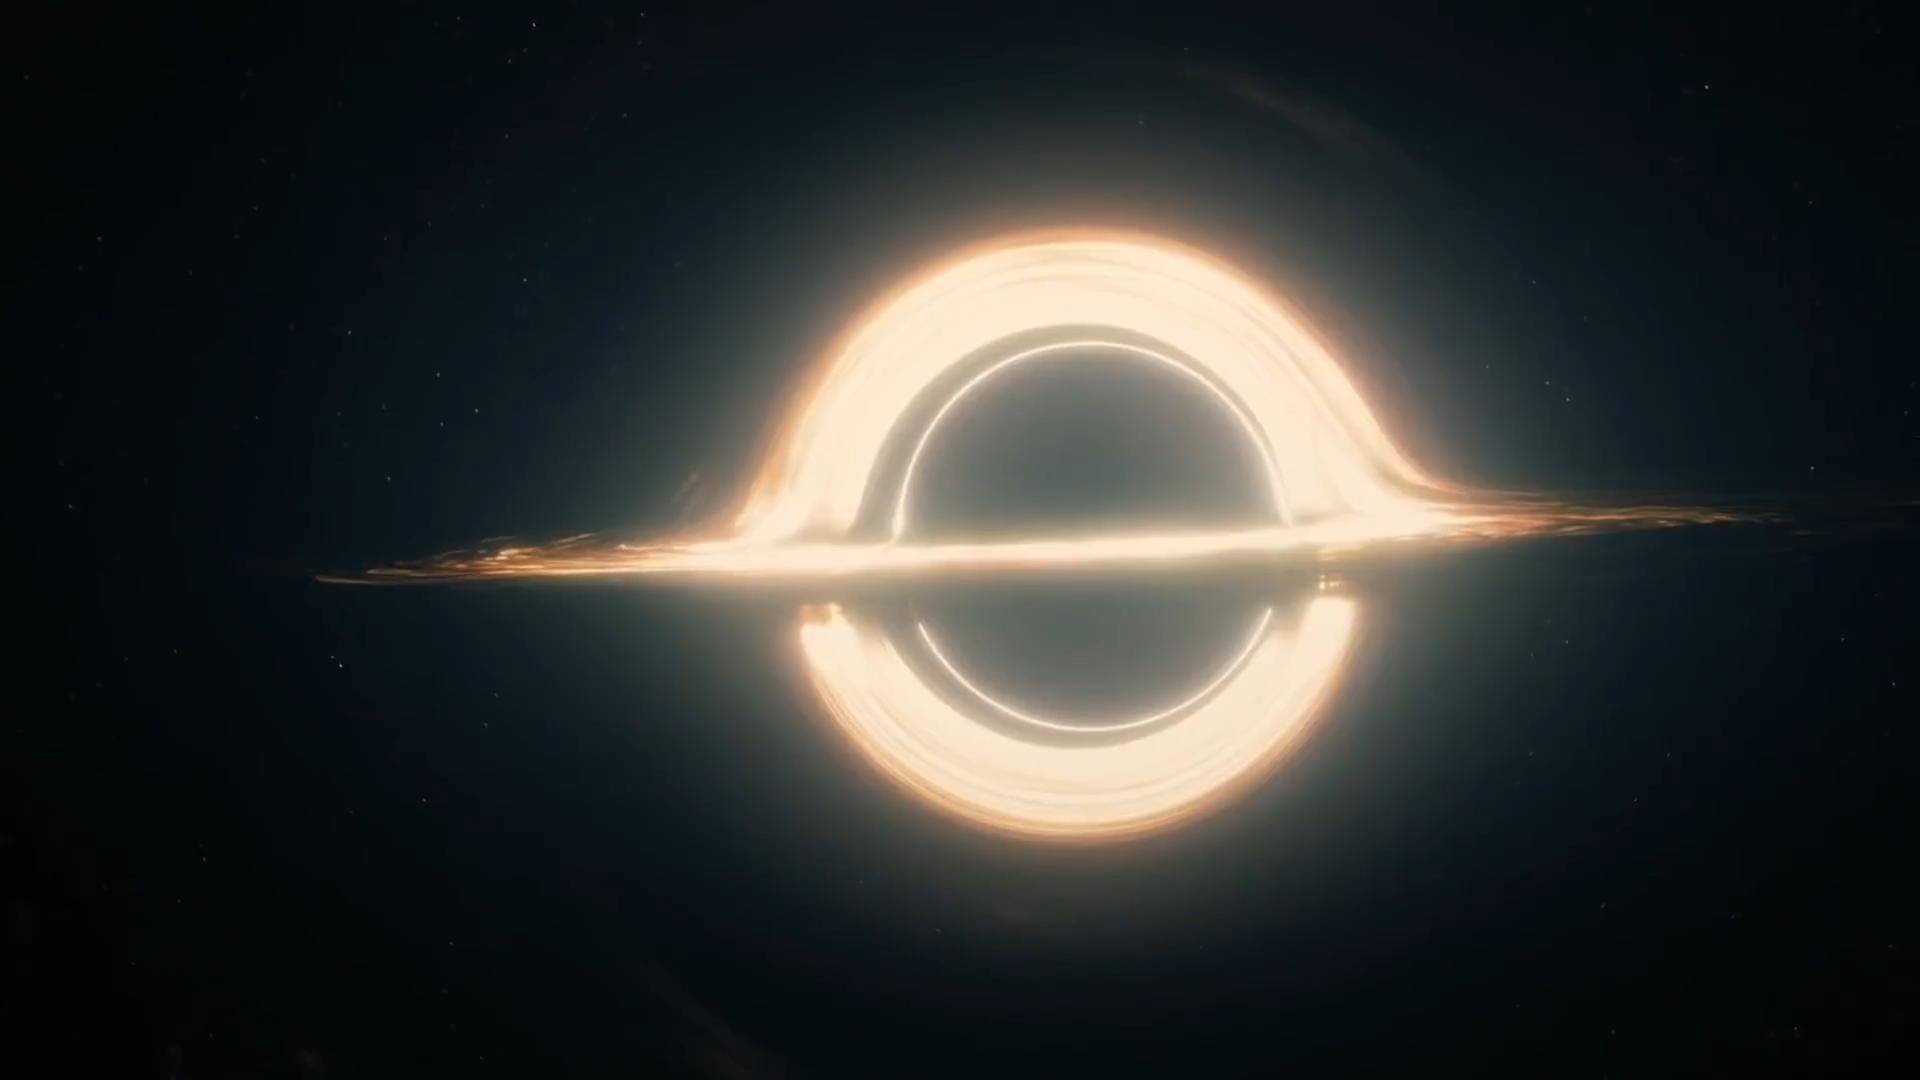 BH and accretion disk in Interstellar